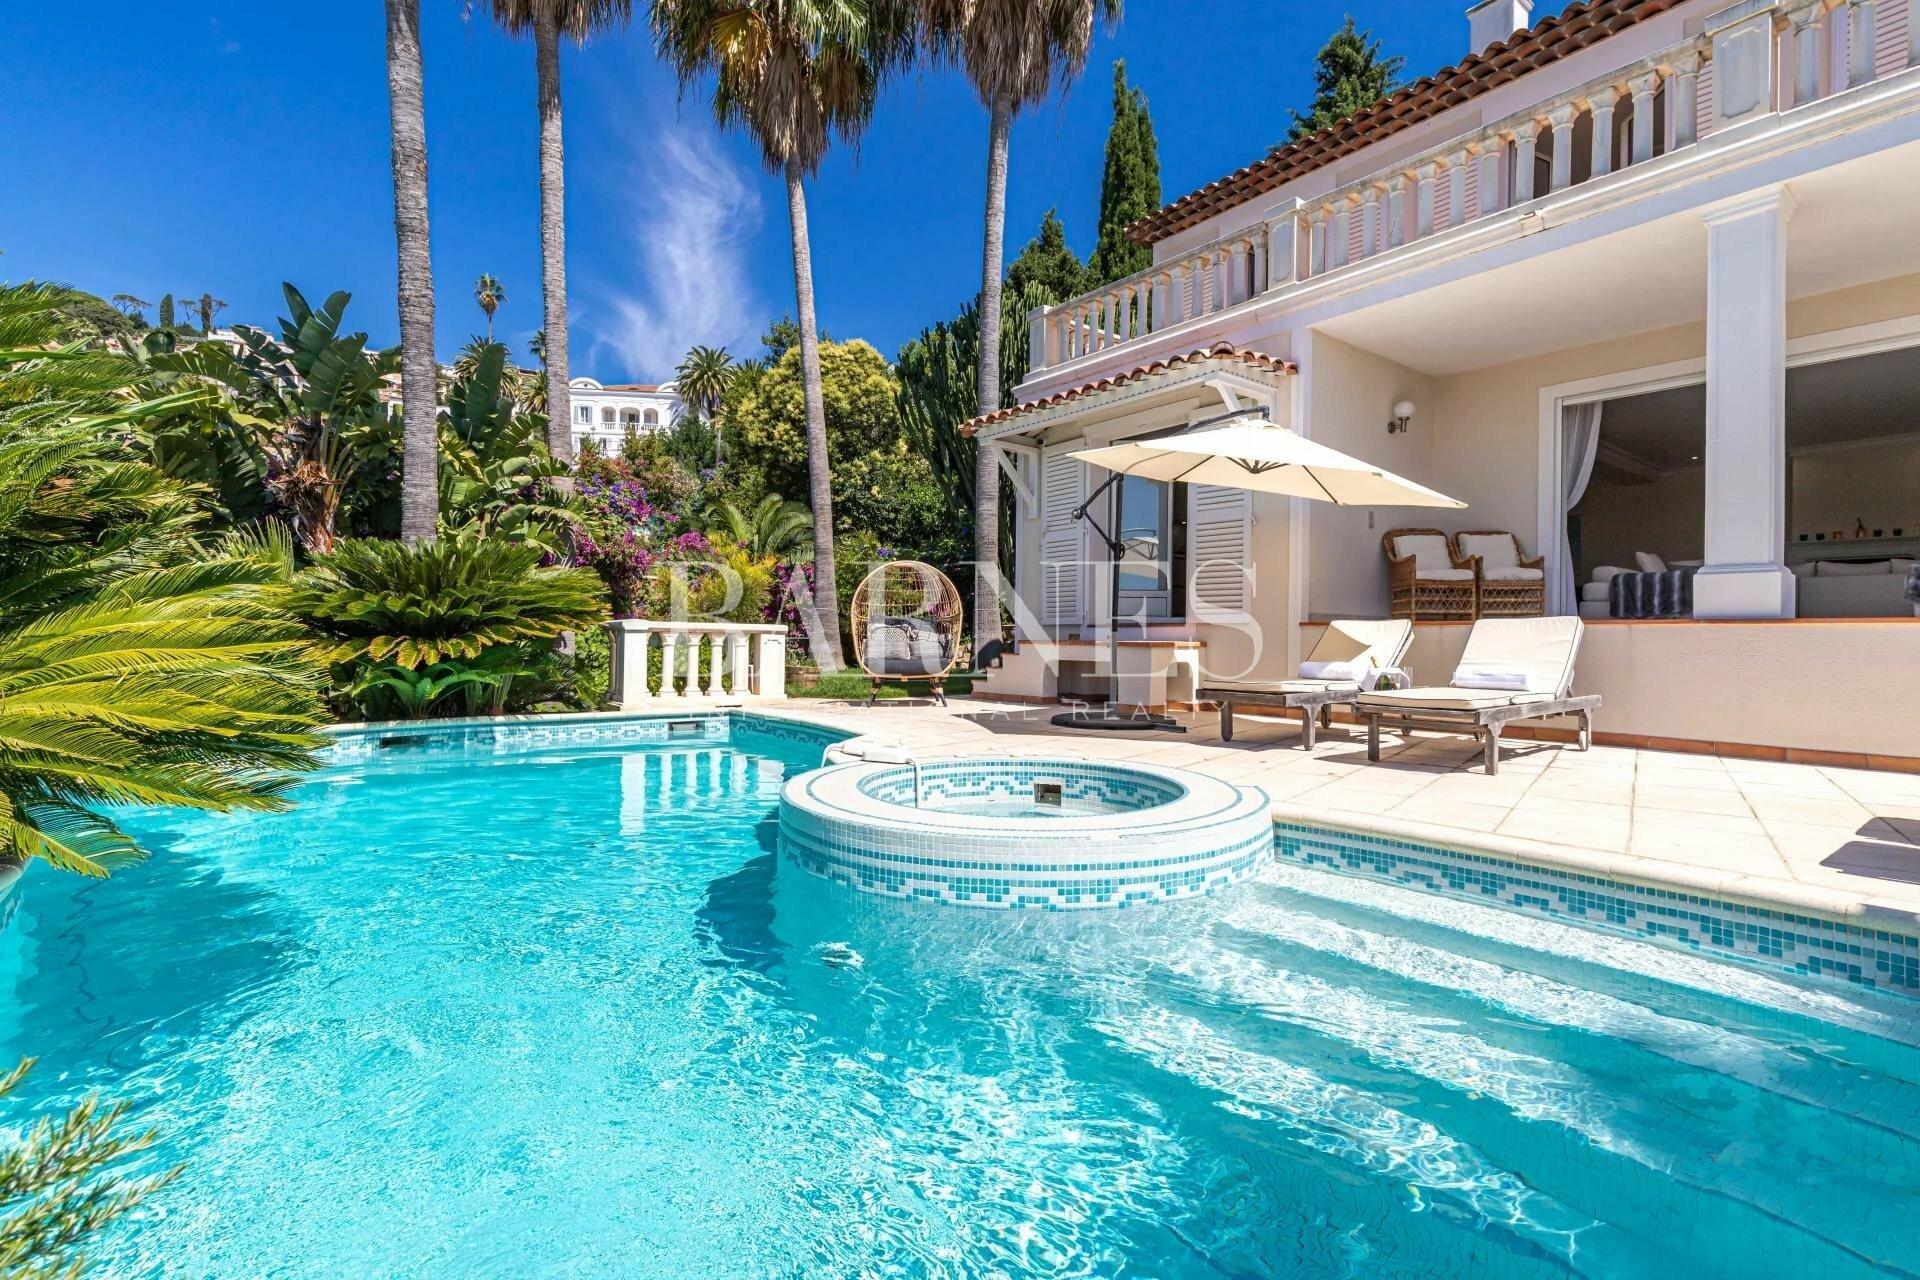 Villa in Vallauris, Provence-Alpes-Côte d'Azur, France 1 - 11527073